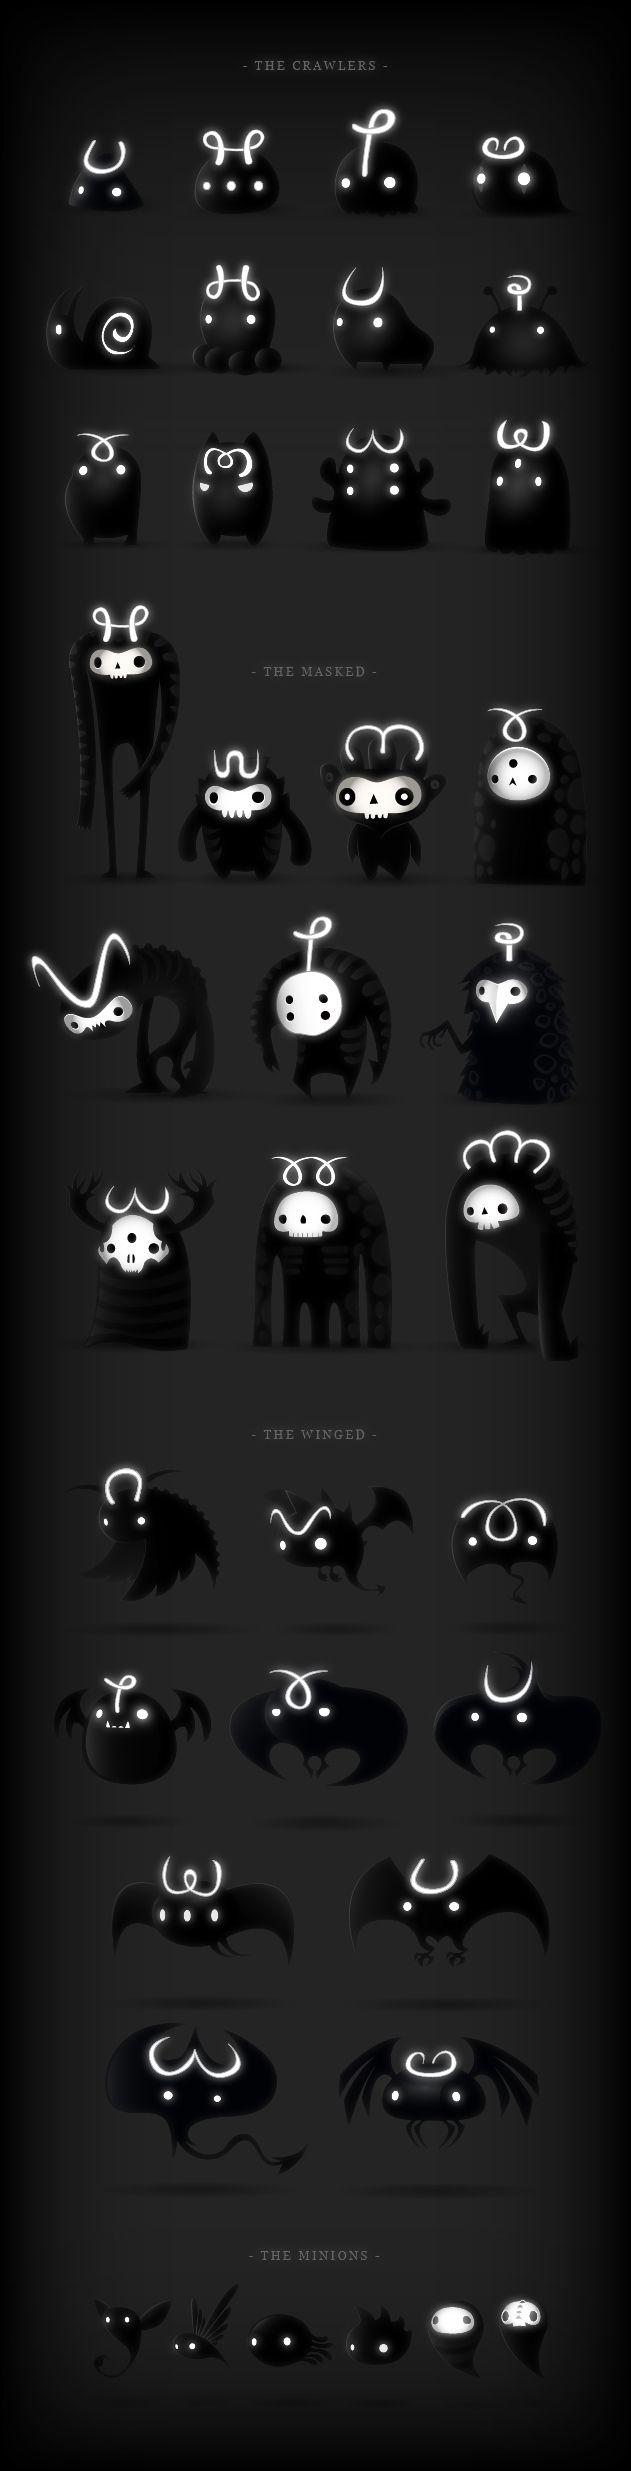 Darklings on Behance